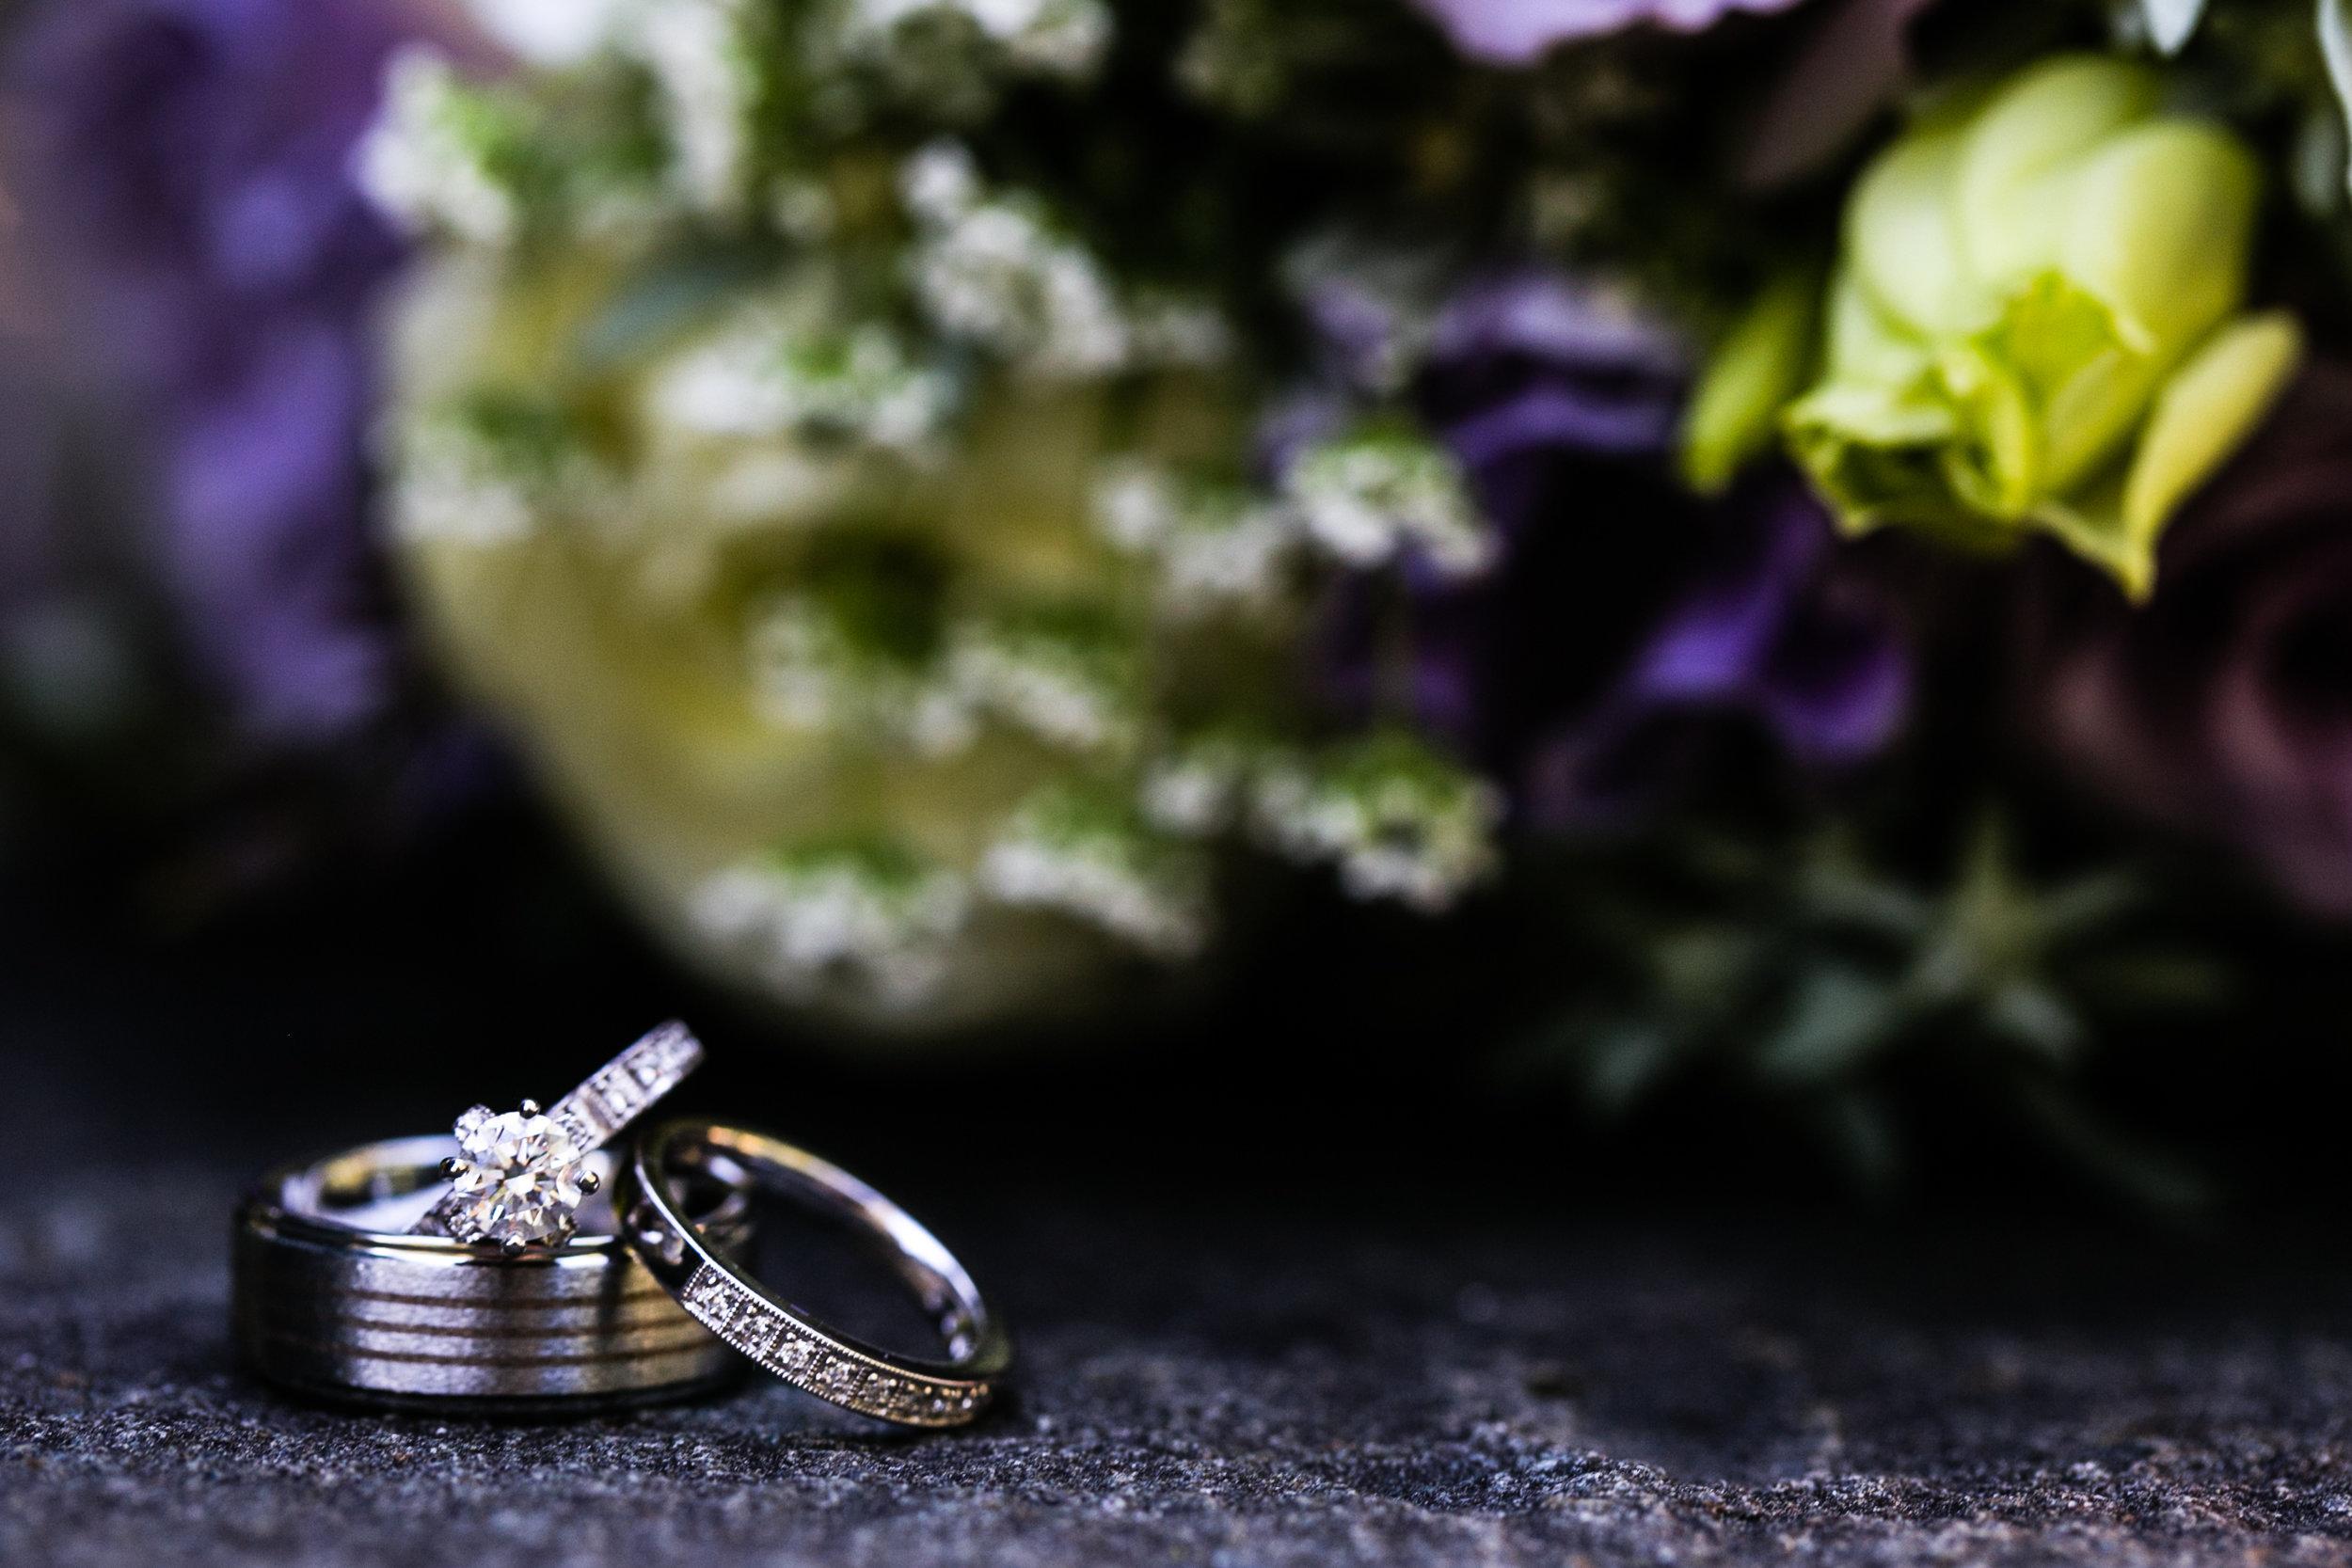 TYLER ARBORETUM WEDDING PHOTOGRAPHY LOVESTRUCK PICTURES-046.jpg